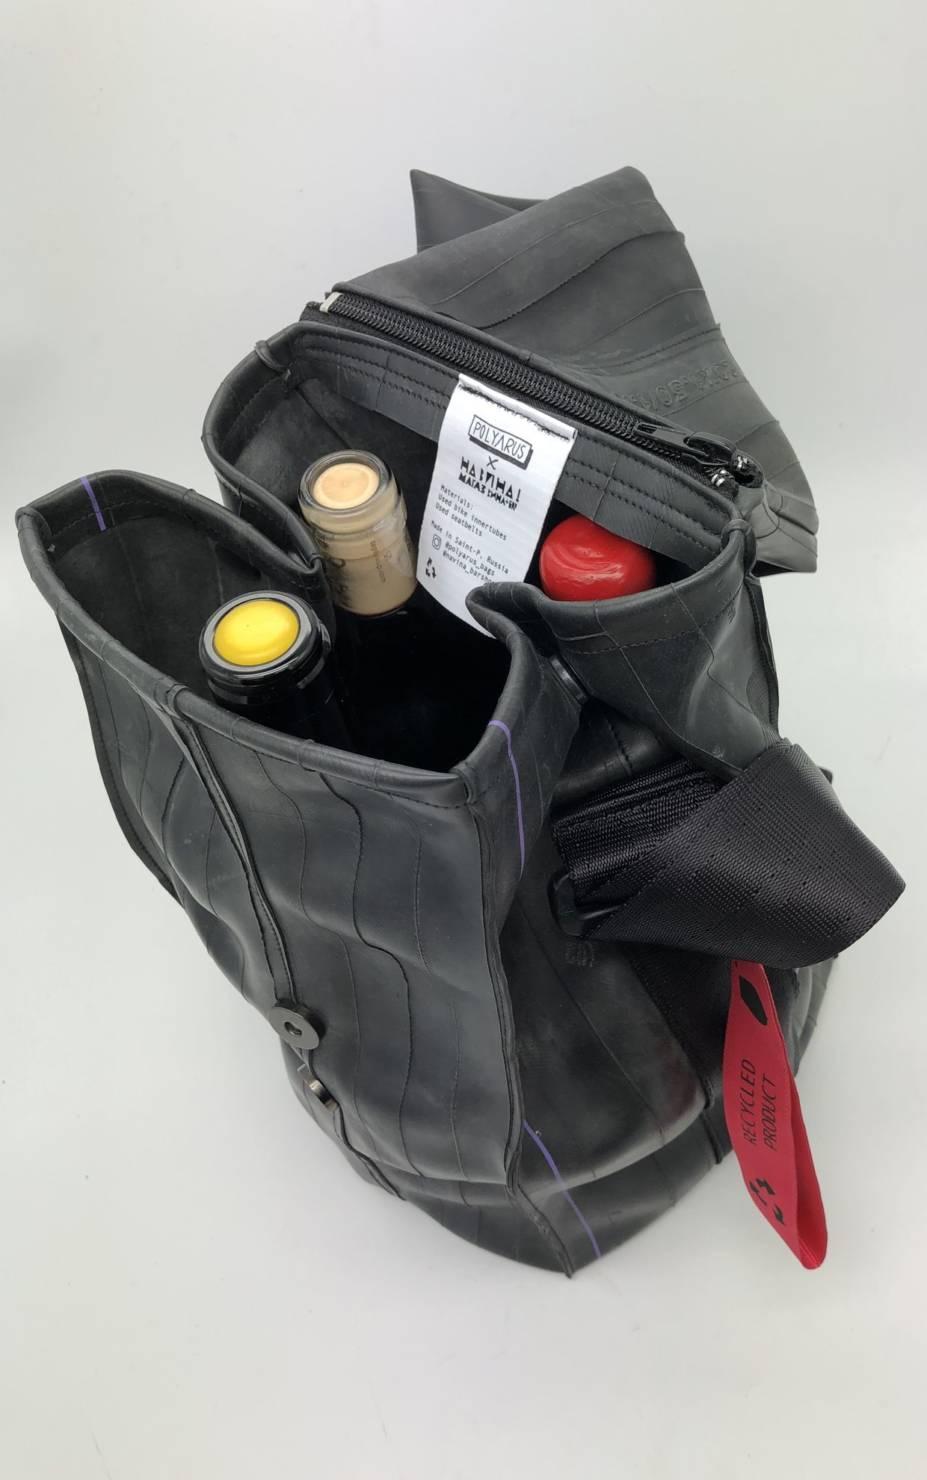 сумки для вина, polyarus, на вина, винный бар, модная коллаборация, сумка бутылка, экосумка